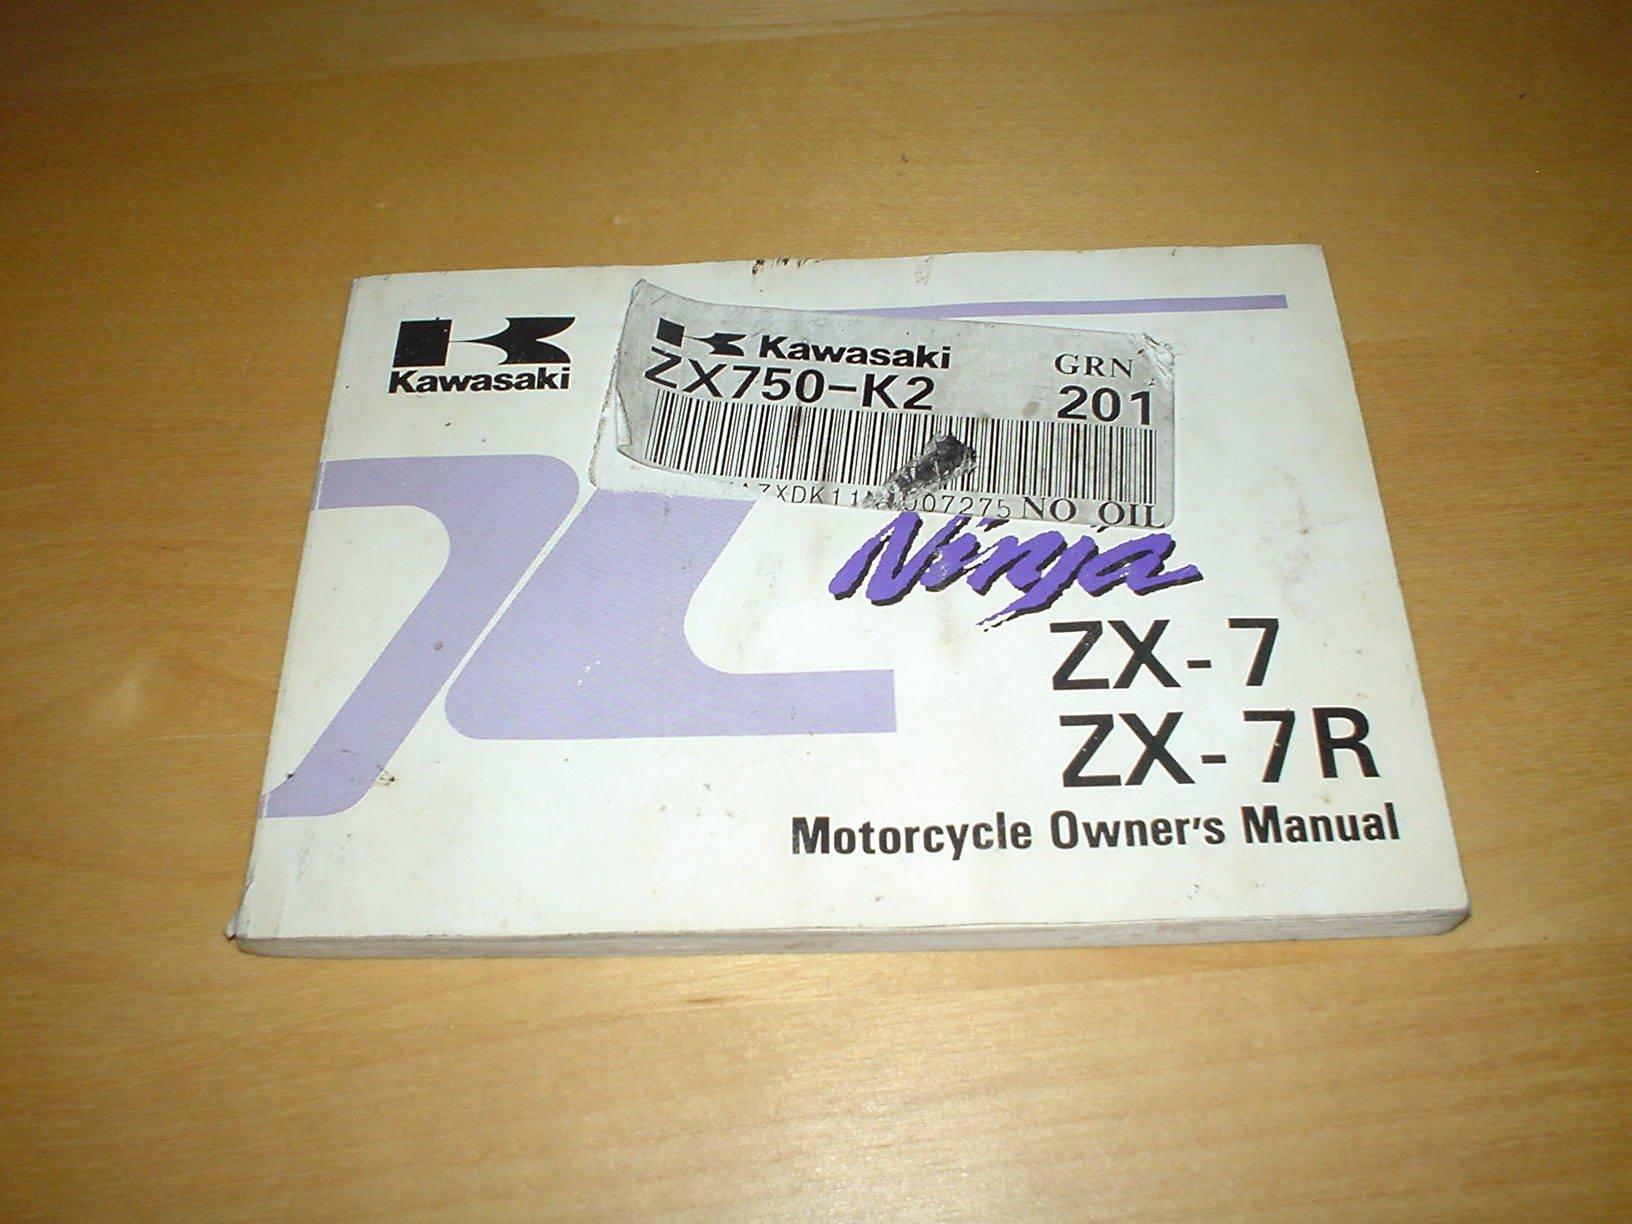 Kawasaki Motorcycle Ninja Zx 7r 7 Zx7r Zx7 Zx750 750 J2 K2 Wiring Diagram Owners Handbook Manual Bike Hand Book Honda Books